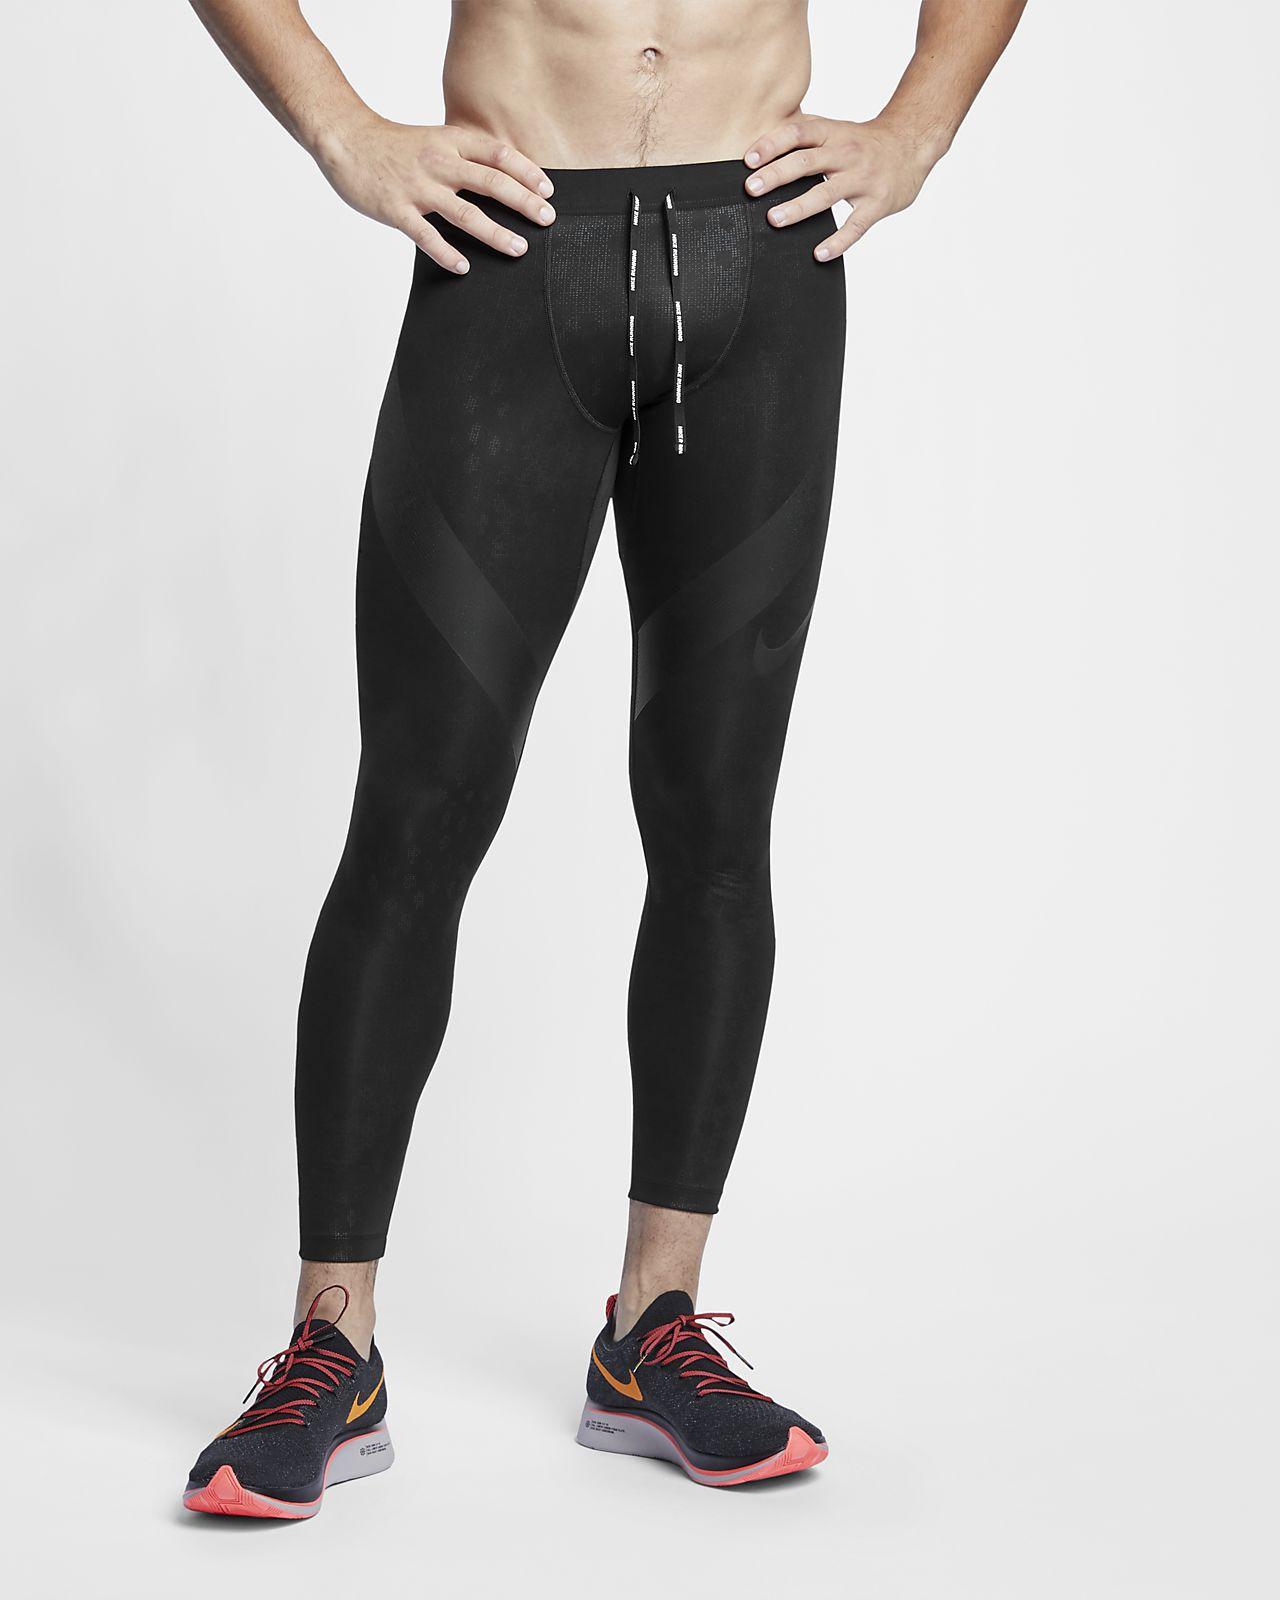 sports shoes 06d1a 10fa5 Nike Power Tech Mallas de running - Hombre